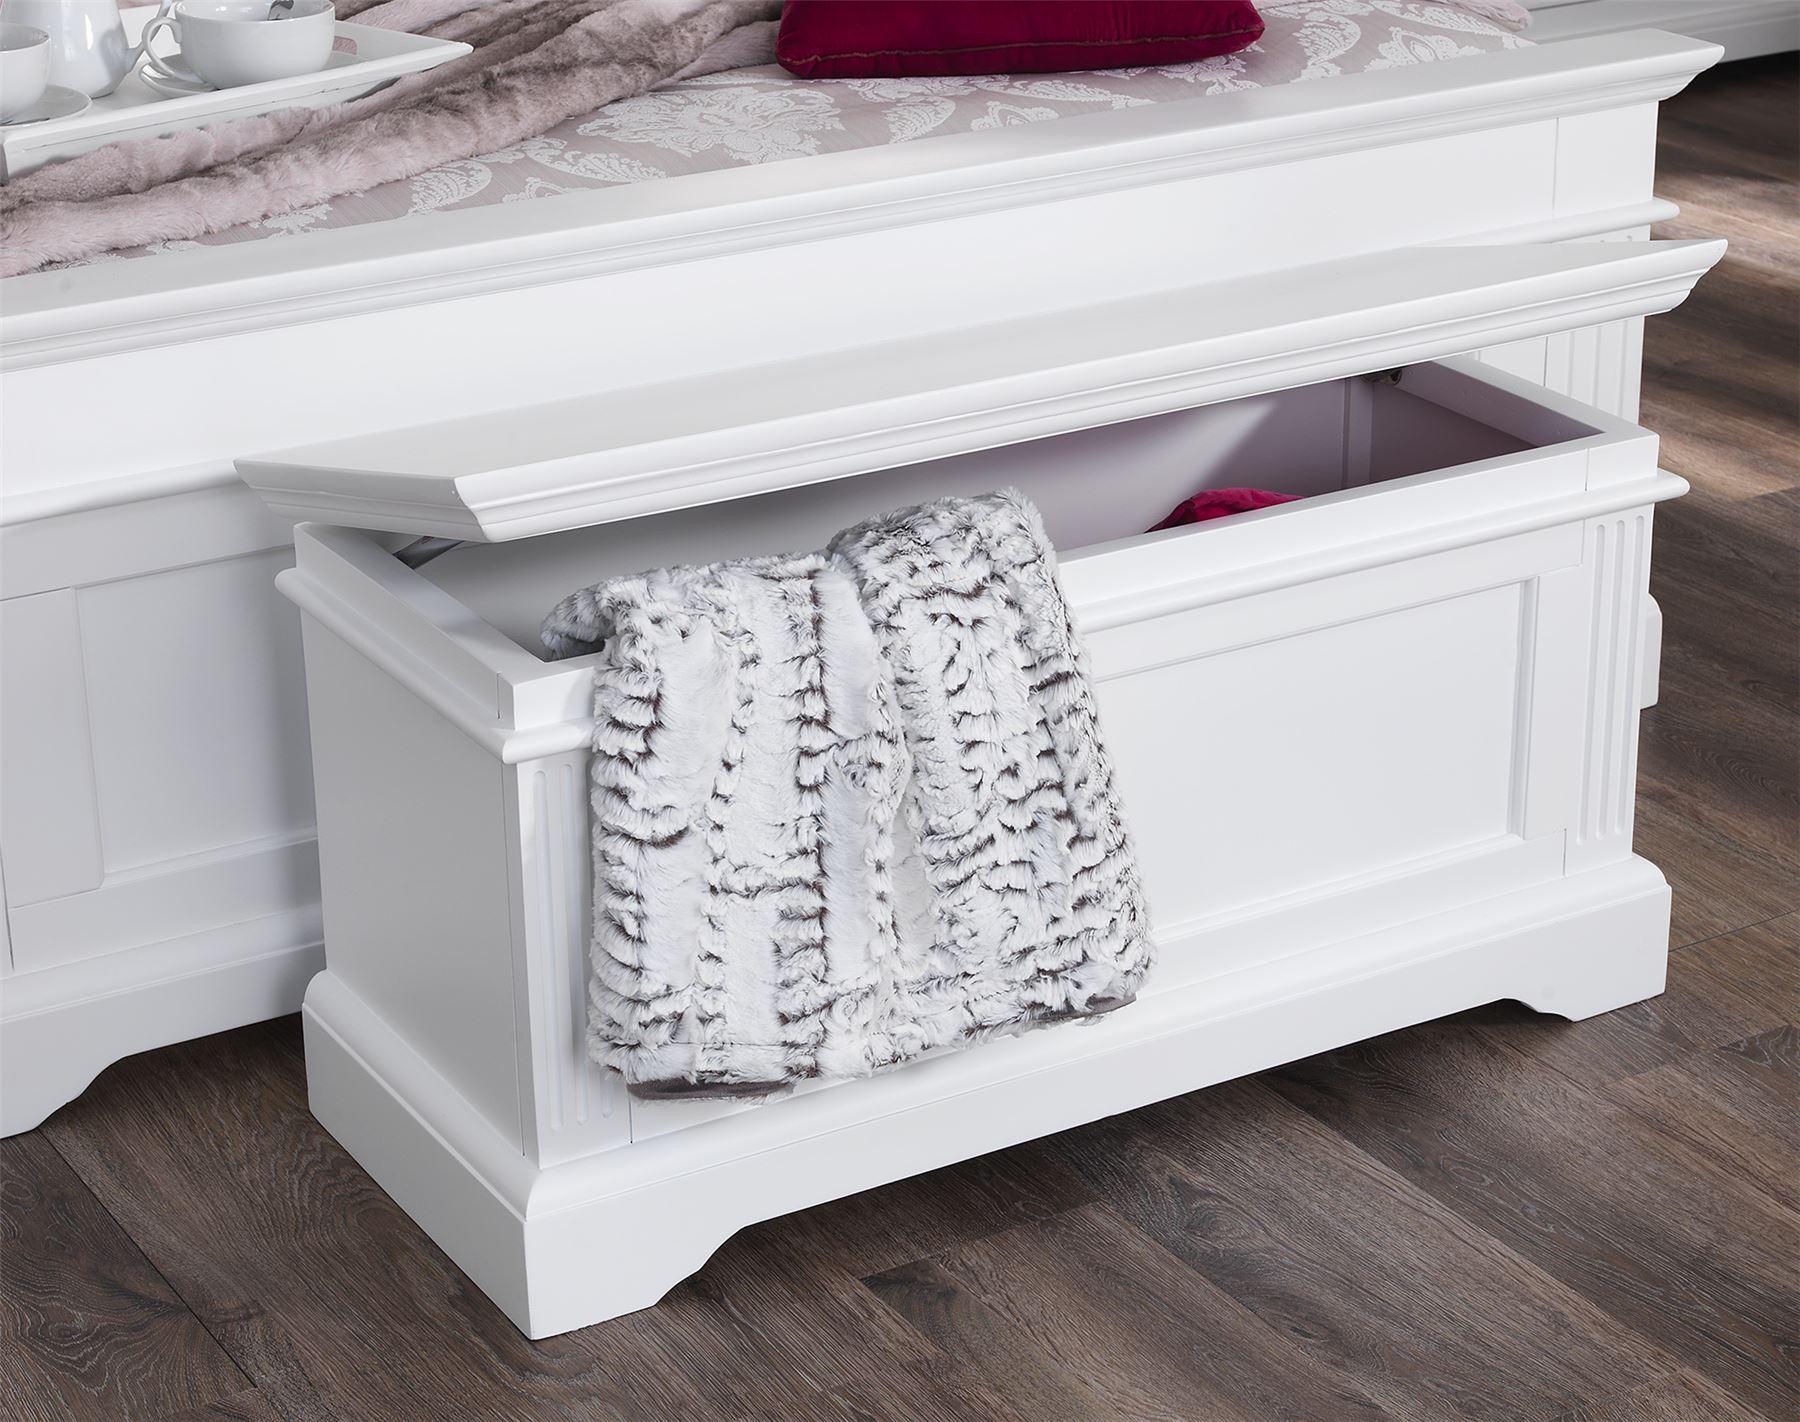 Gainsborough White Bedroom Furniture, Bedside Cabinets